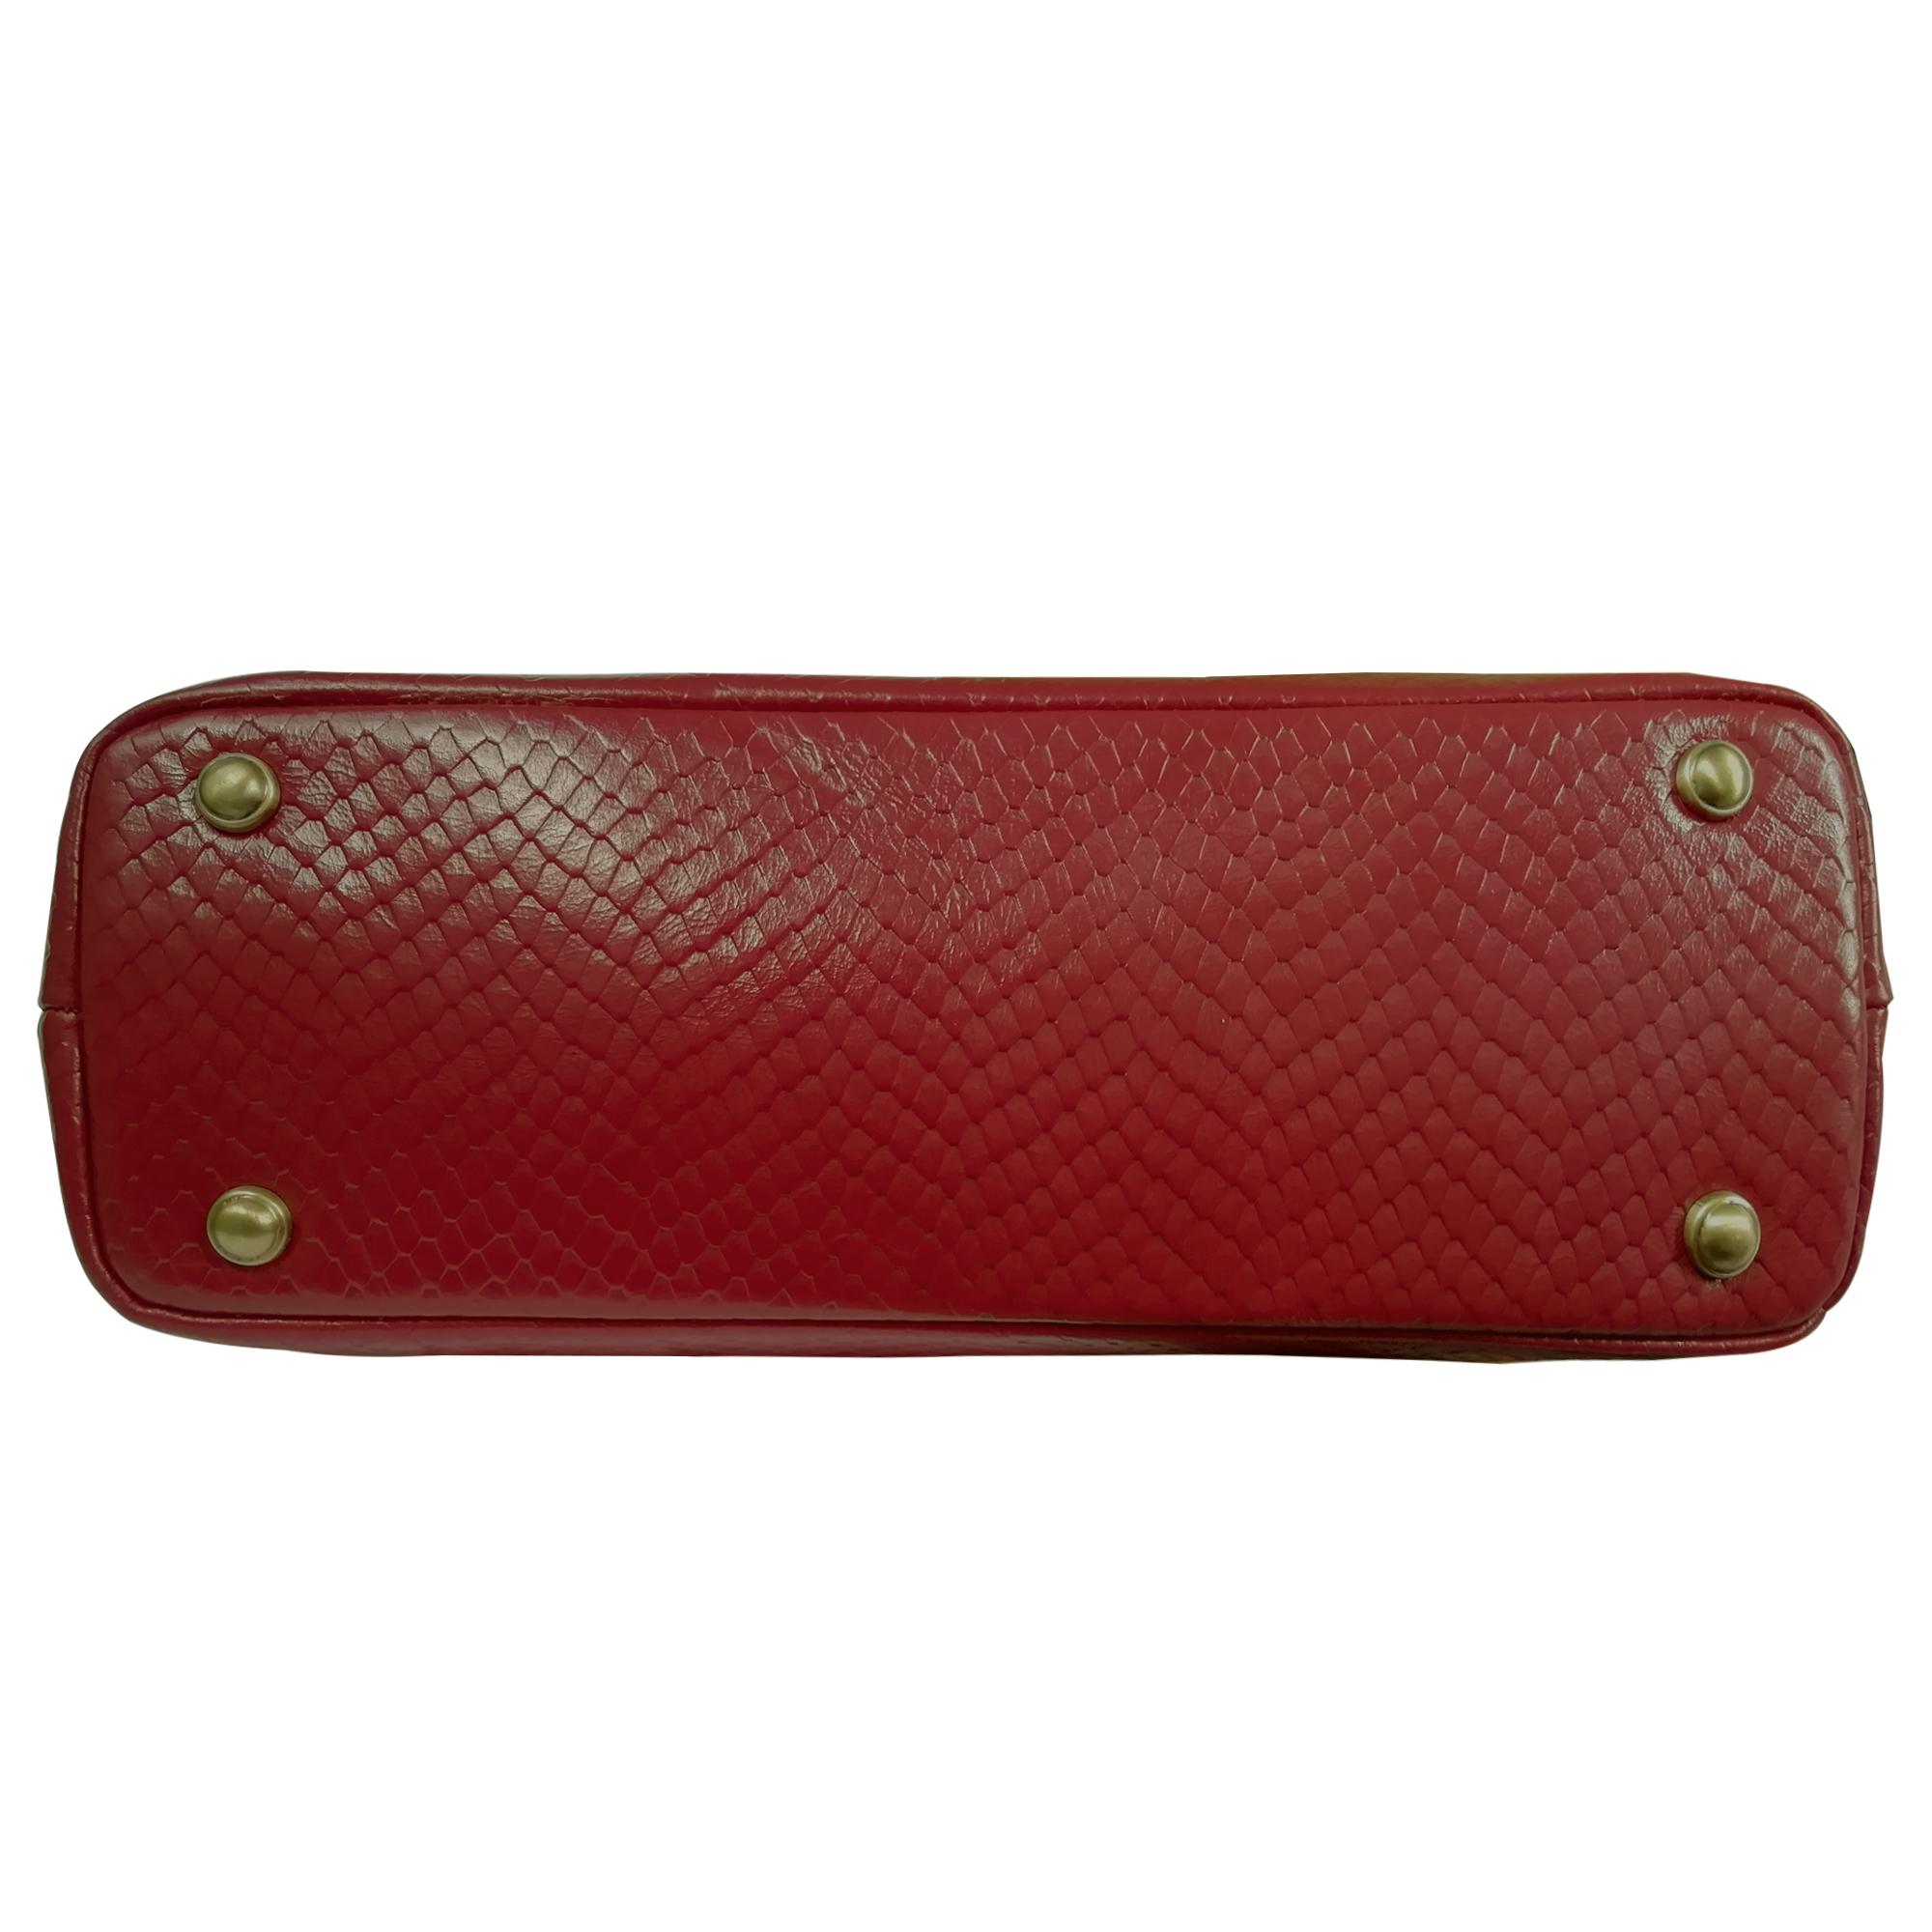 Leather Fashion Handbag